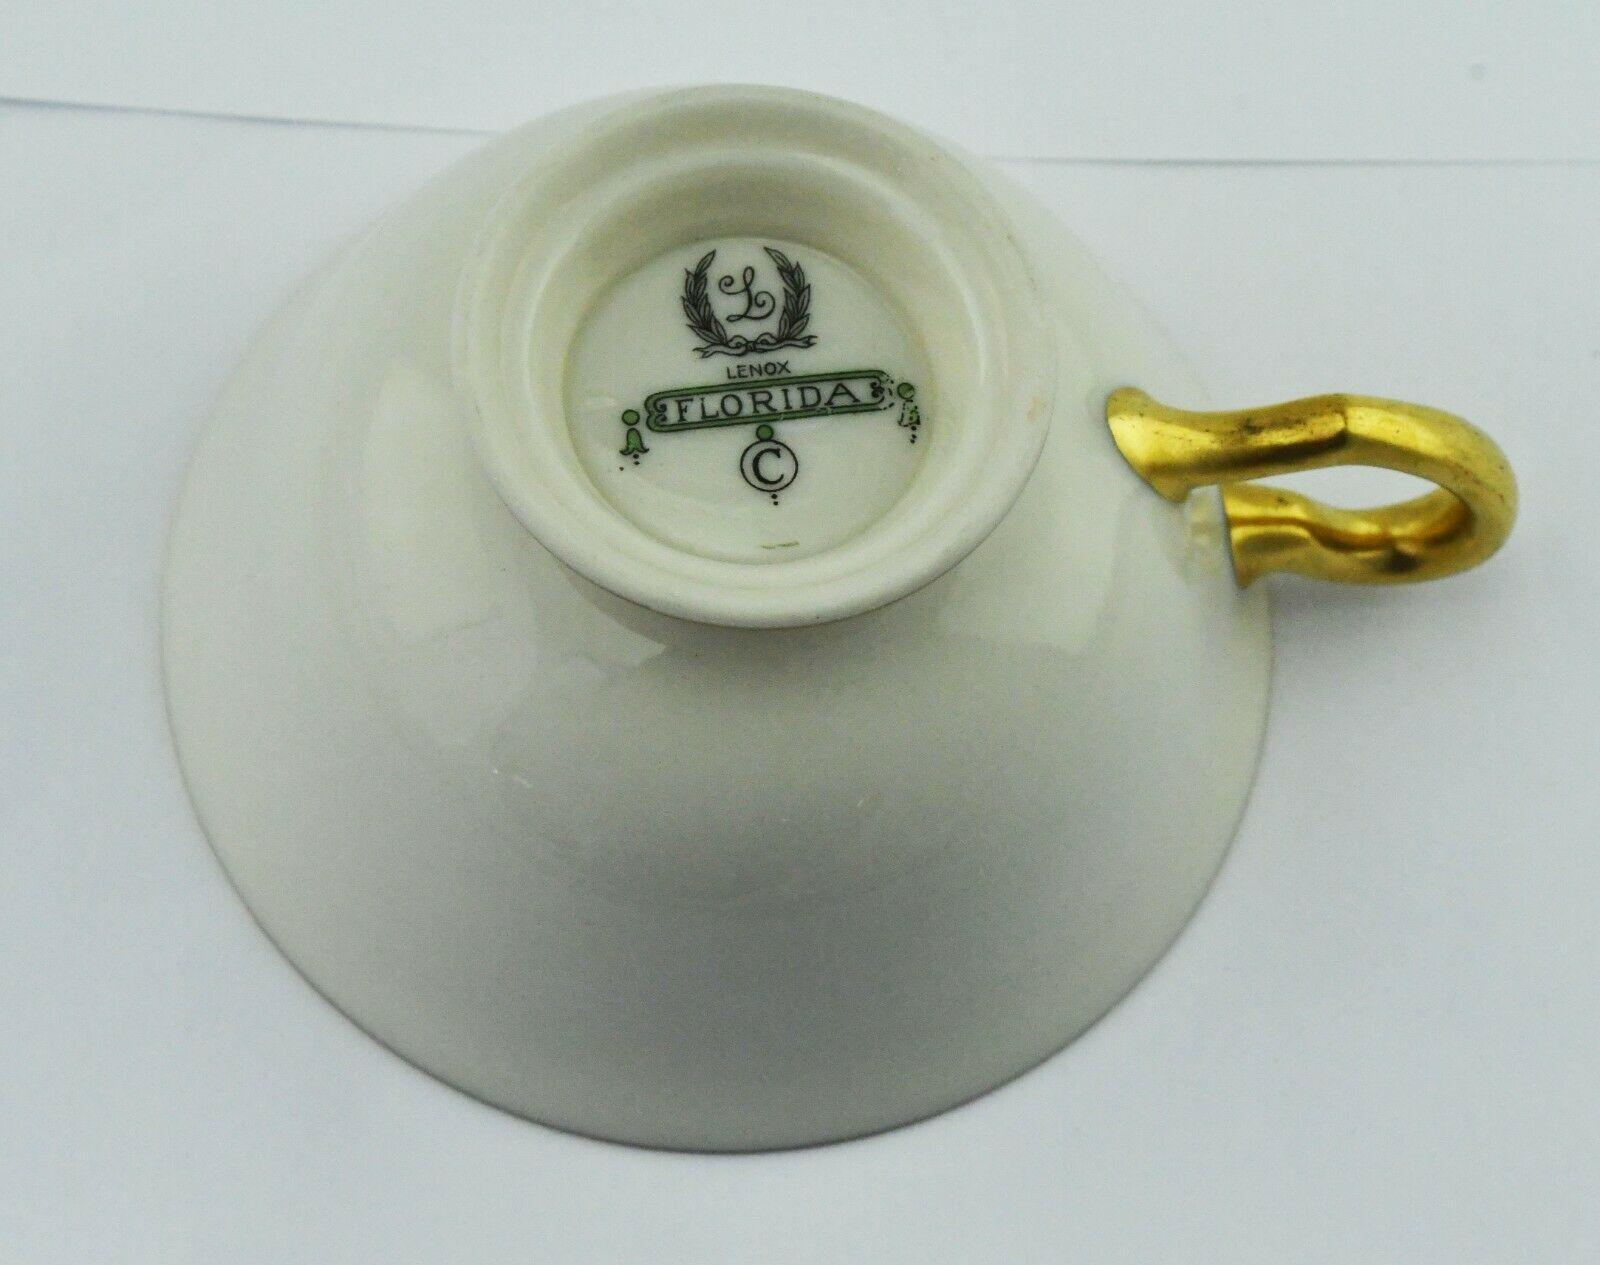 Florida by Lenox Bone China Dinnerware Tea Cup